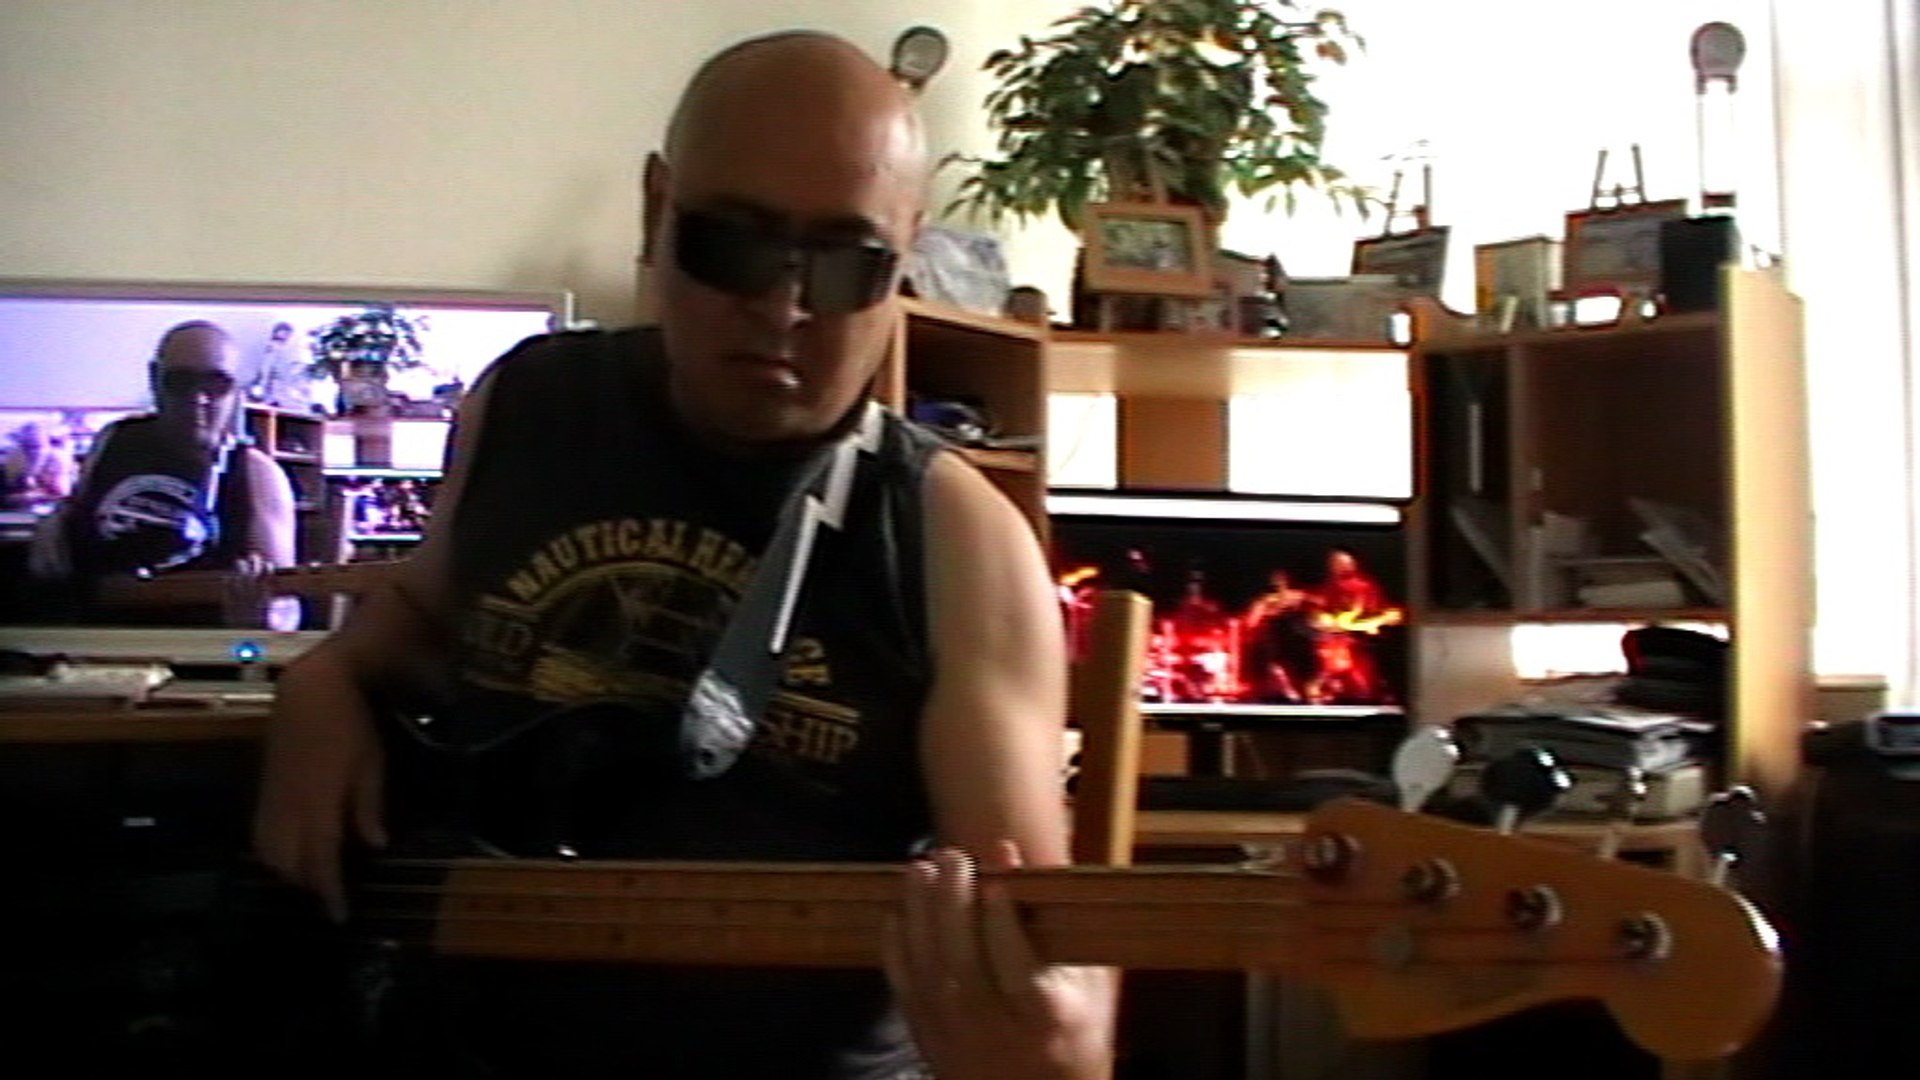 Banda JazzBlues Funk Brasil - Tune 88 Jeff Lorber DVD m2 Basscover Bob Roha